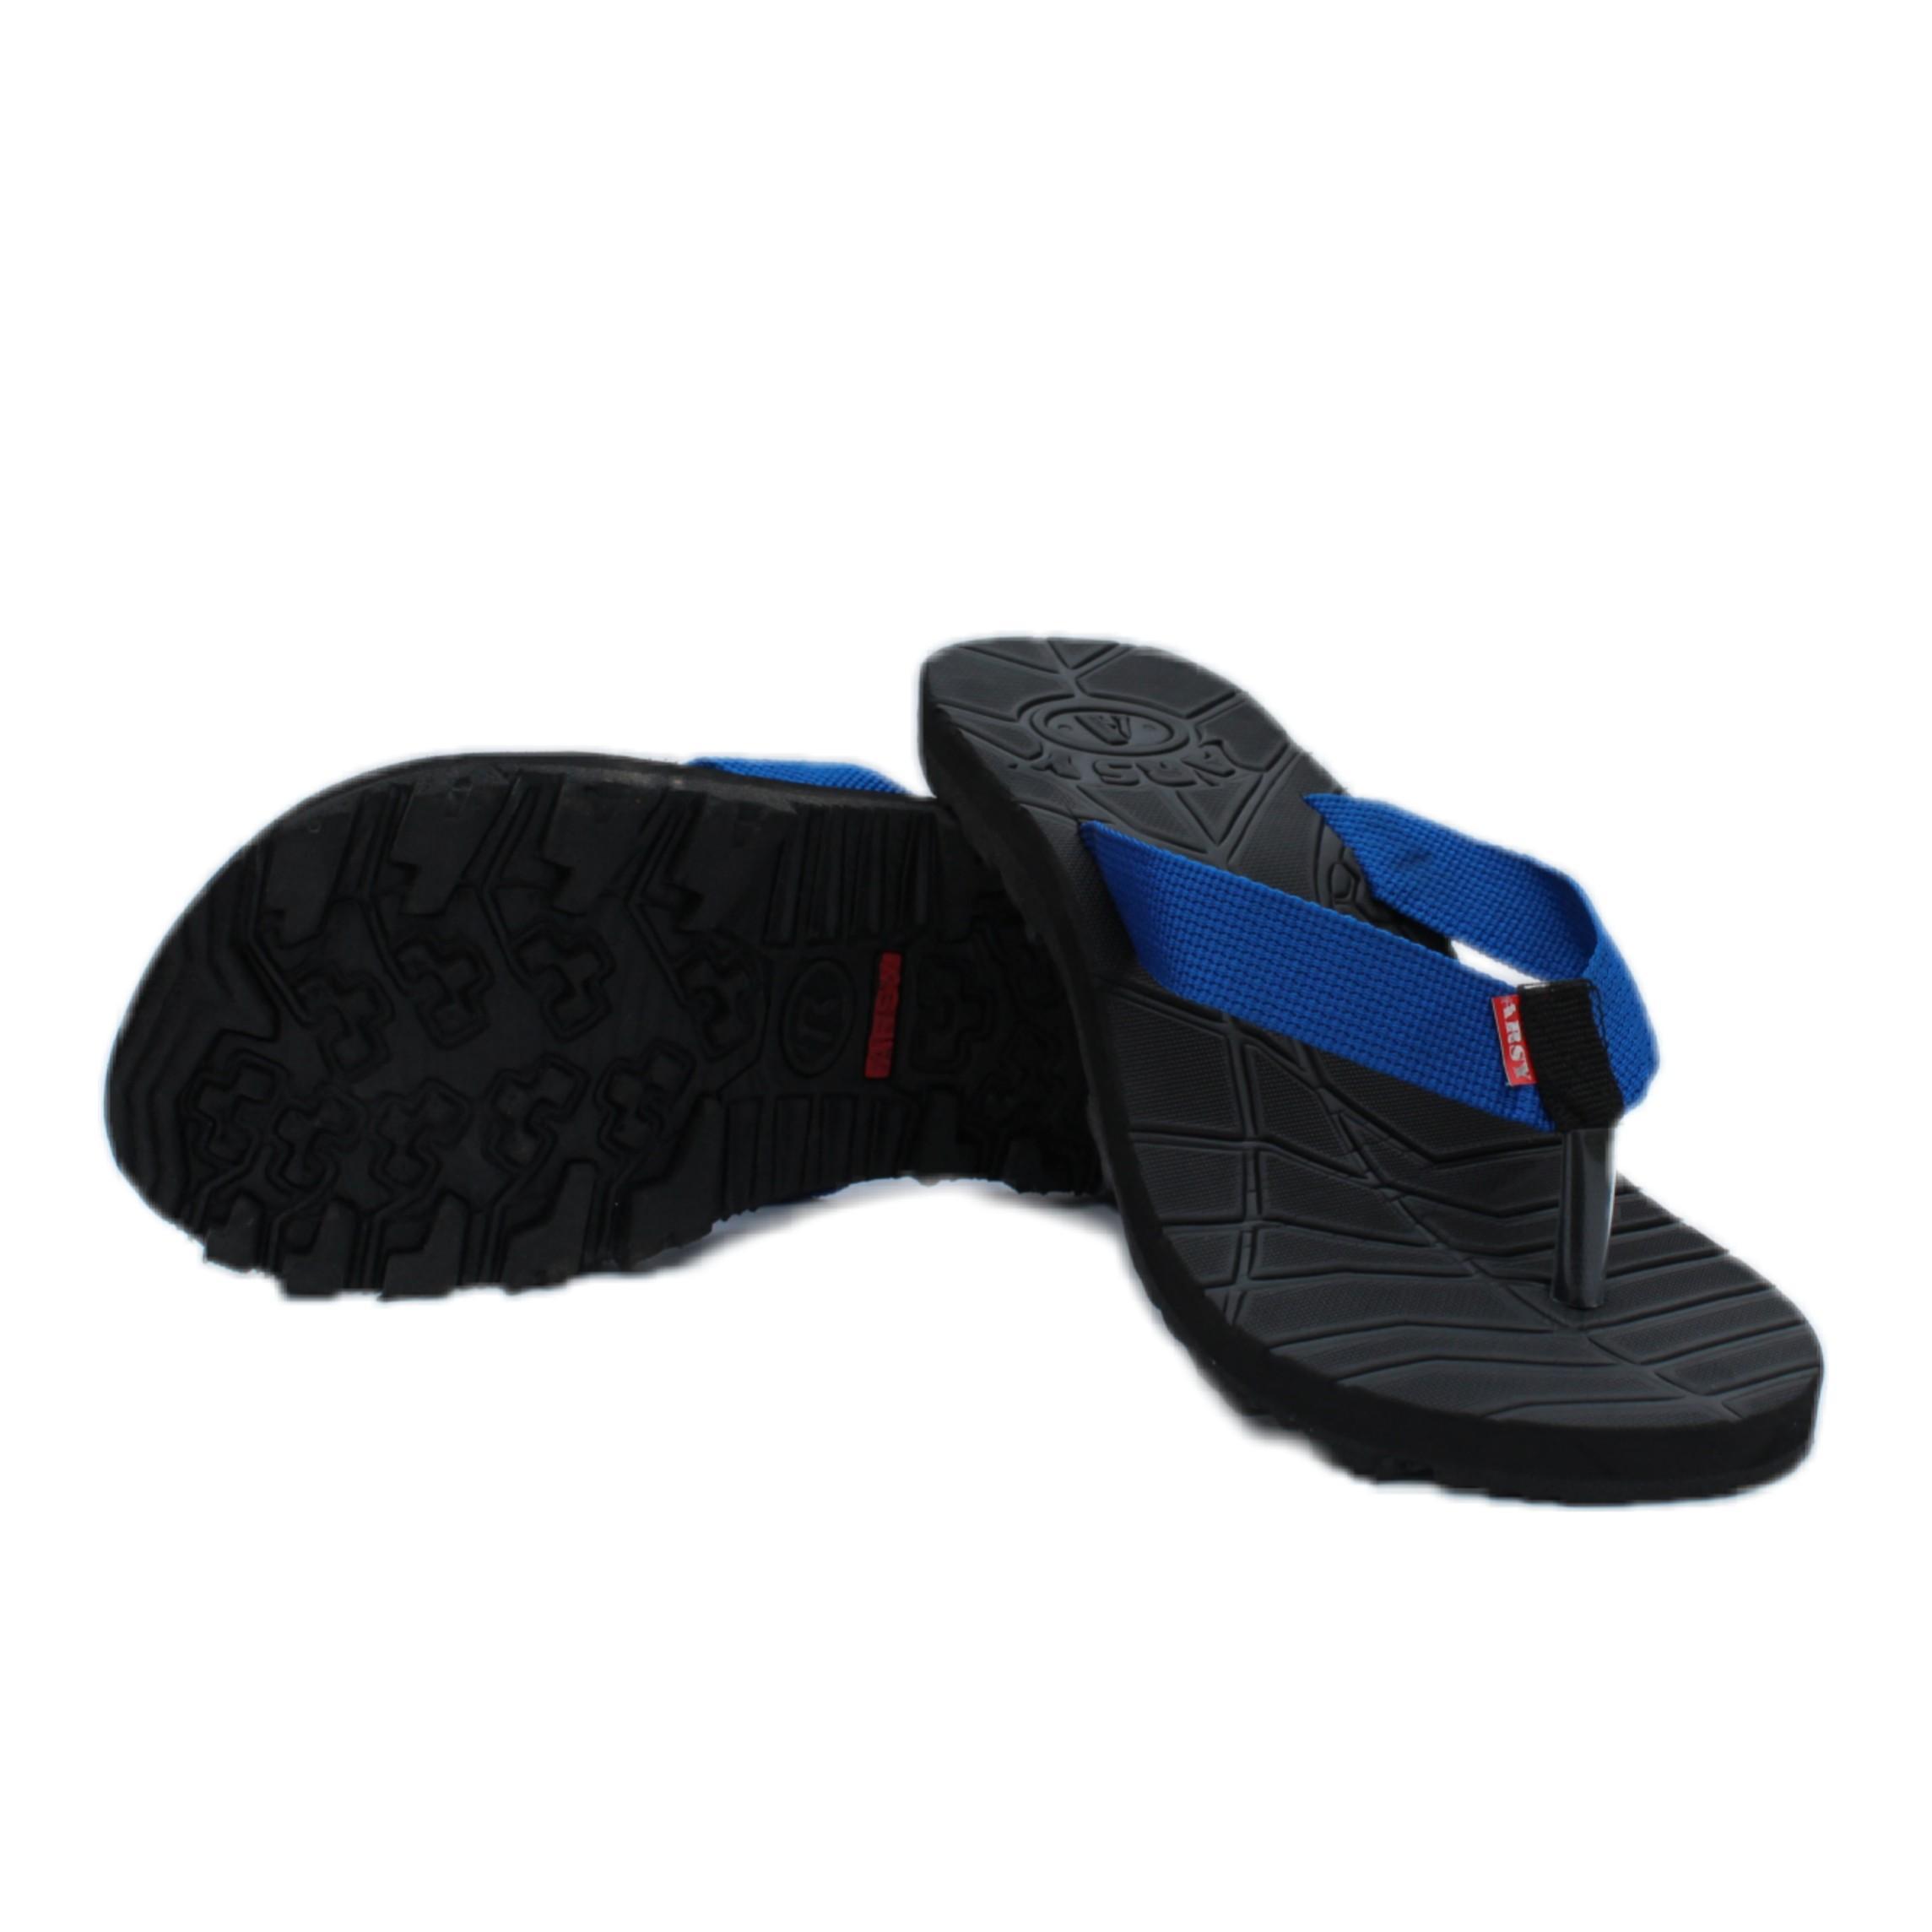 be94abbc54fd0b Arsy Sport   Sandal Gunung   Sandal Pria   Sandal Jepit   Sandal Murah -  Biru